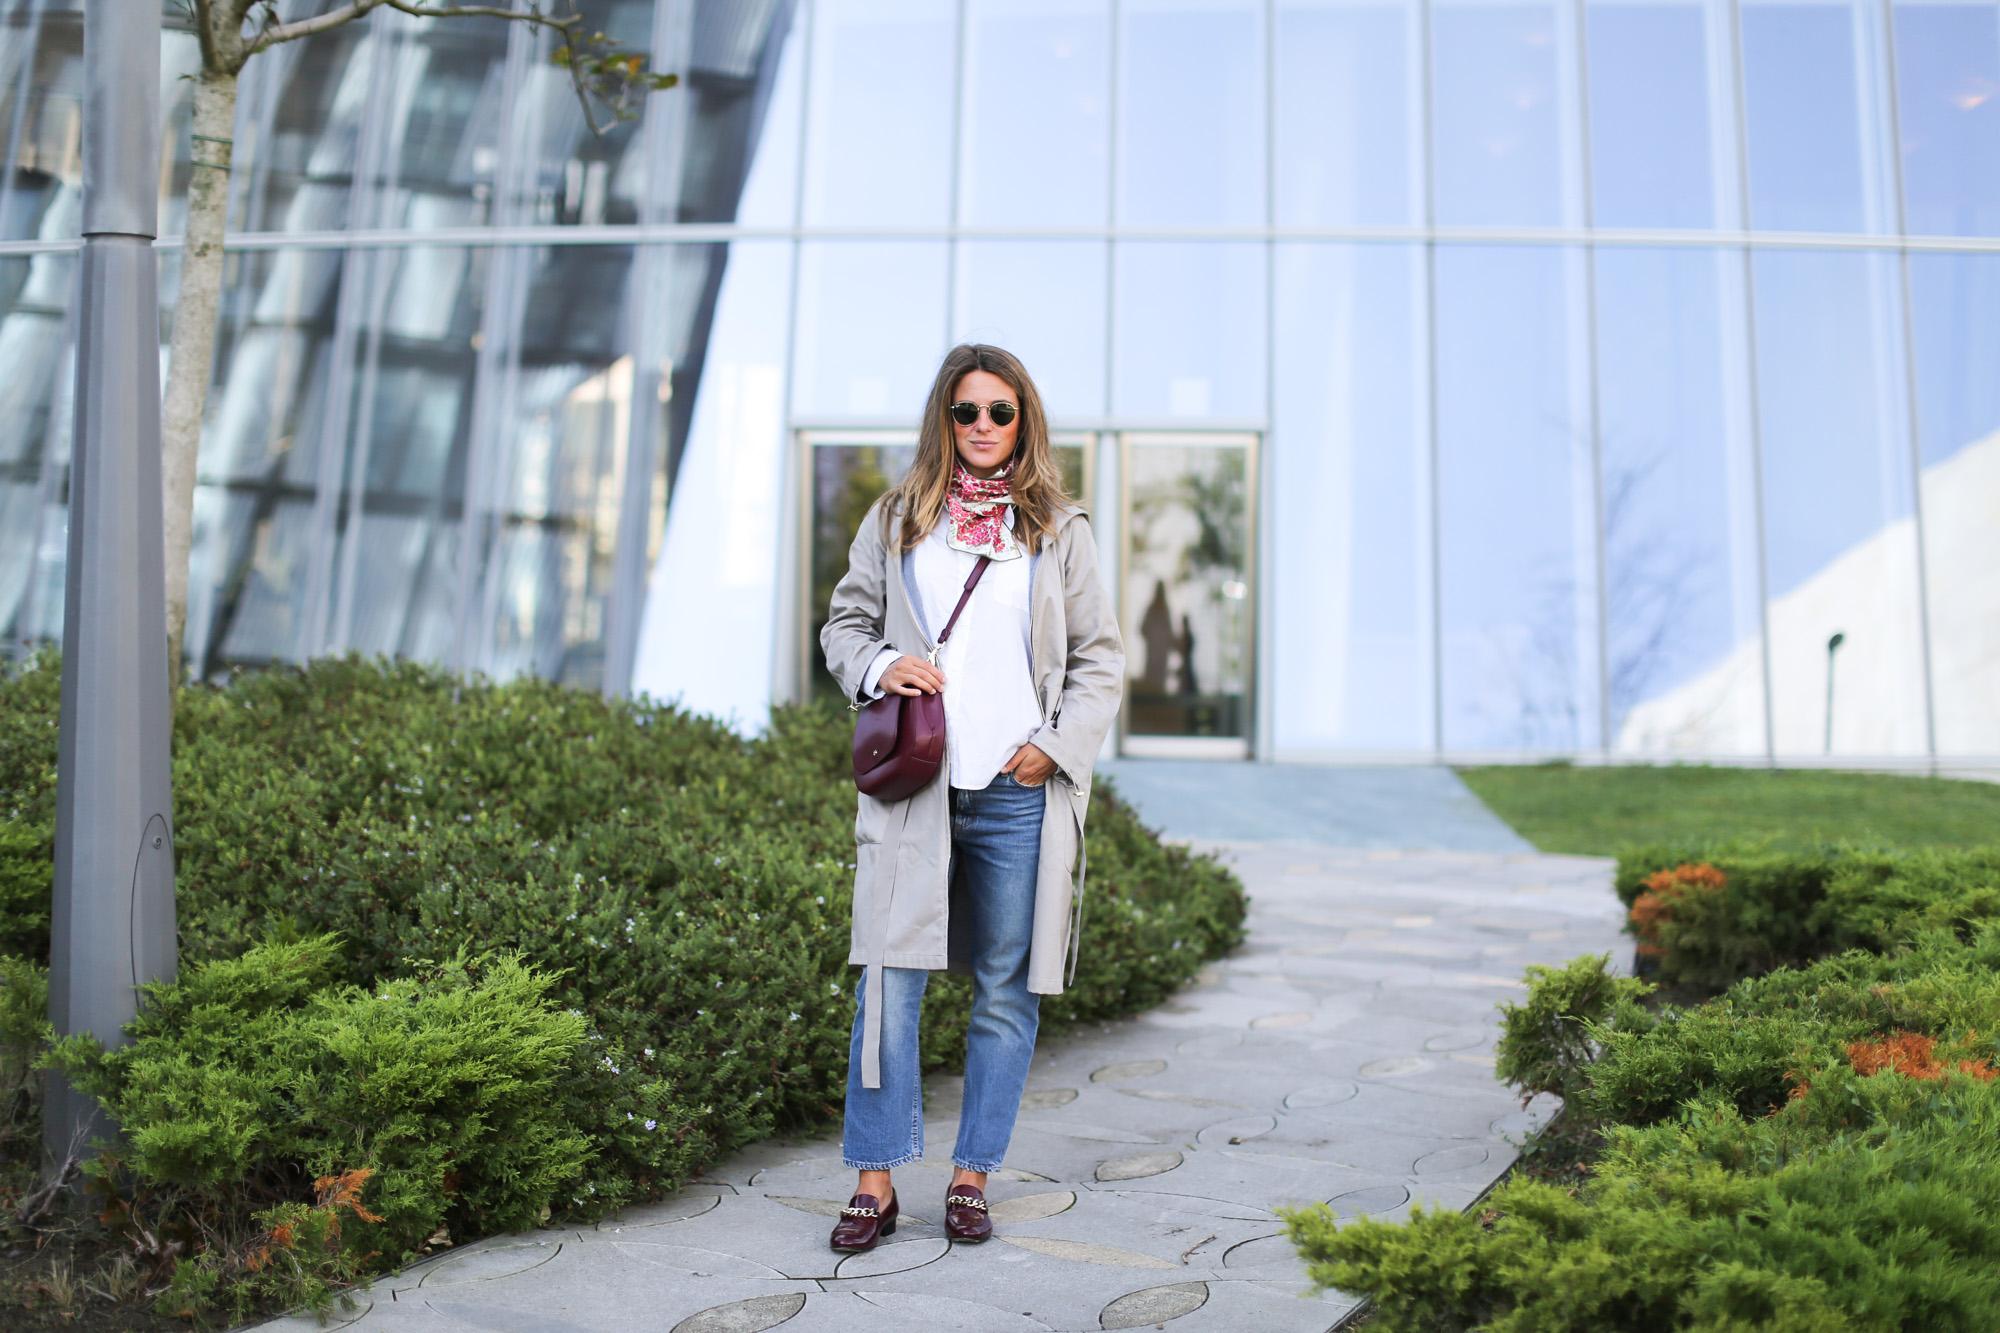 Clochet_streetstyle_fashionblogger_purificaciongarcia_pgbacktothecity_bandolerapielwestfalia_mocasinespielgranates